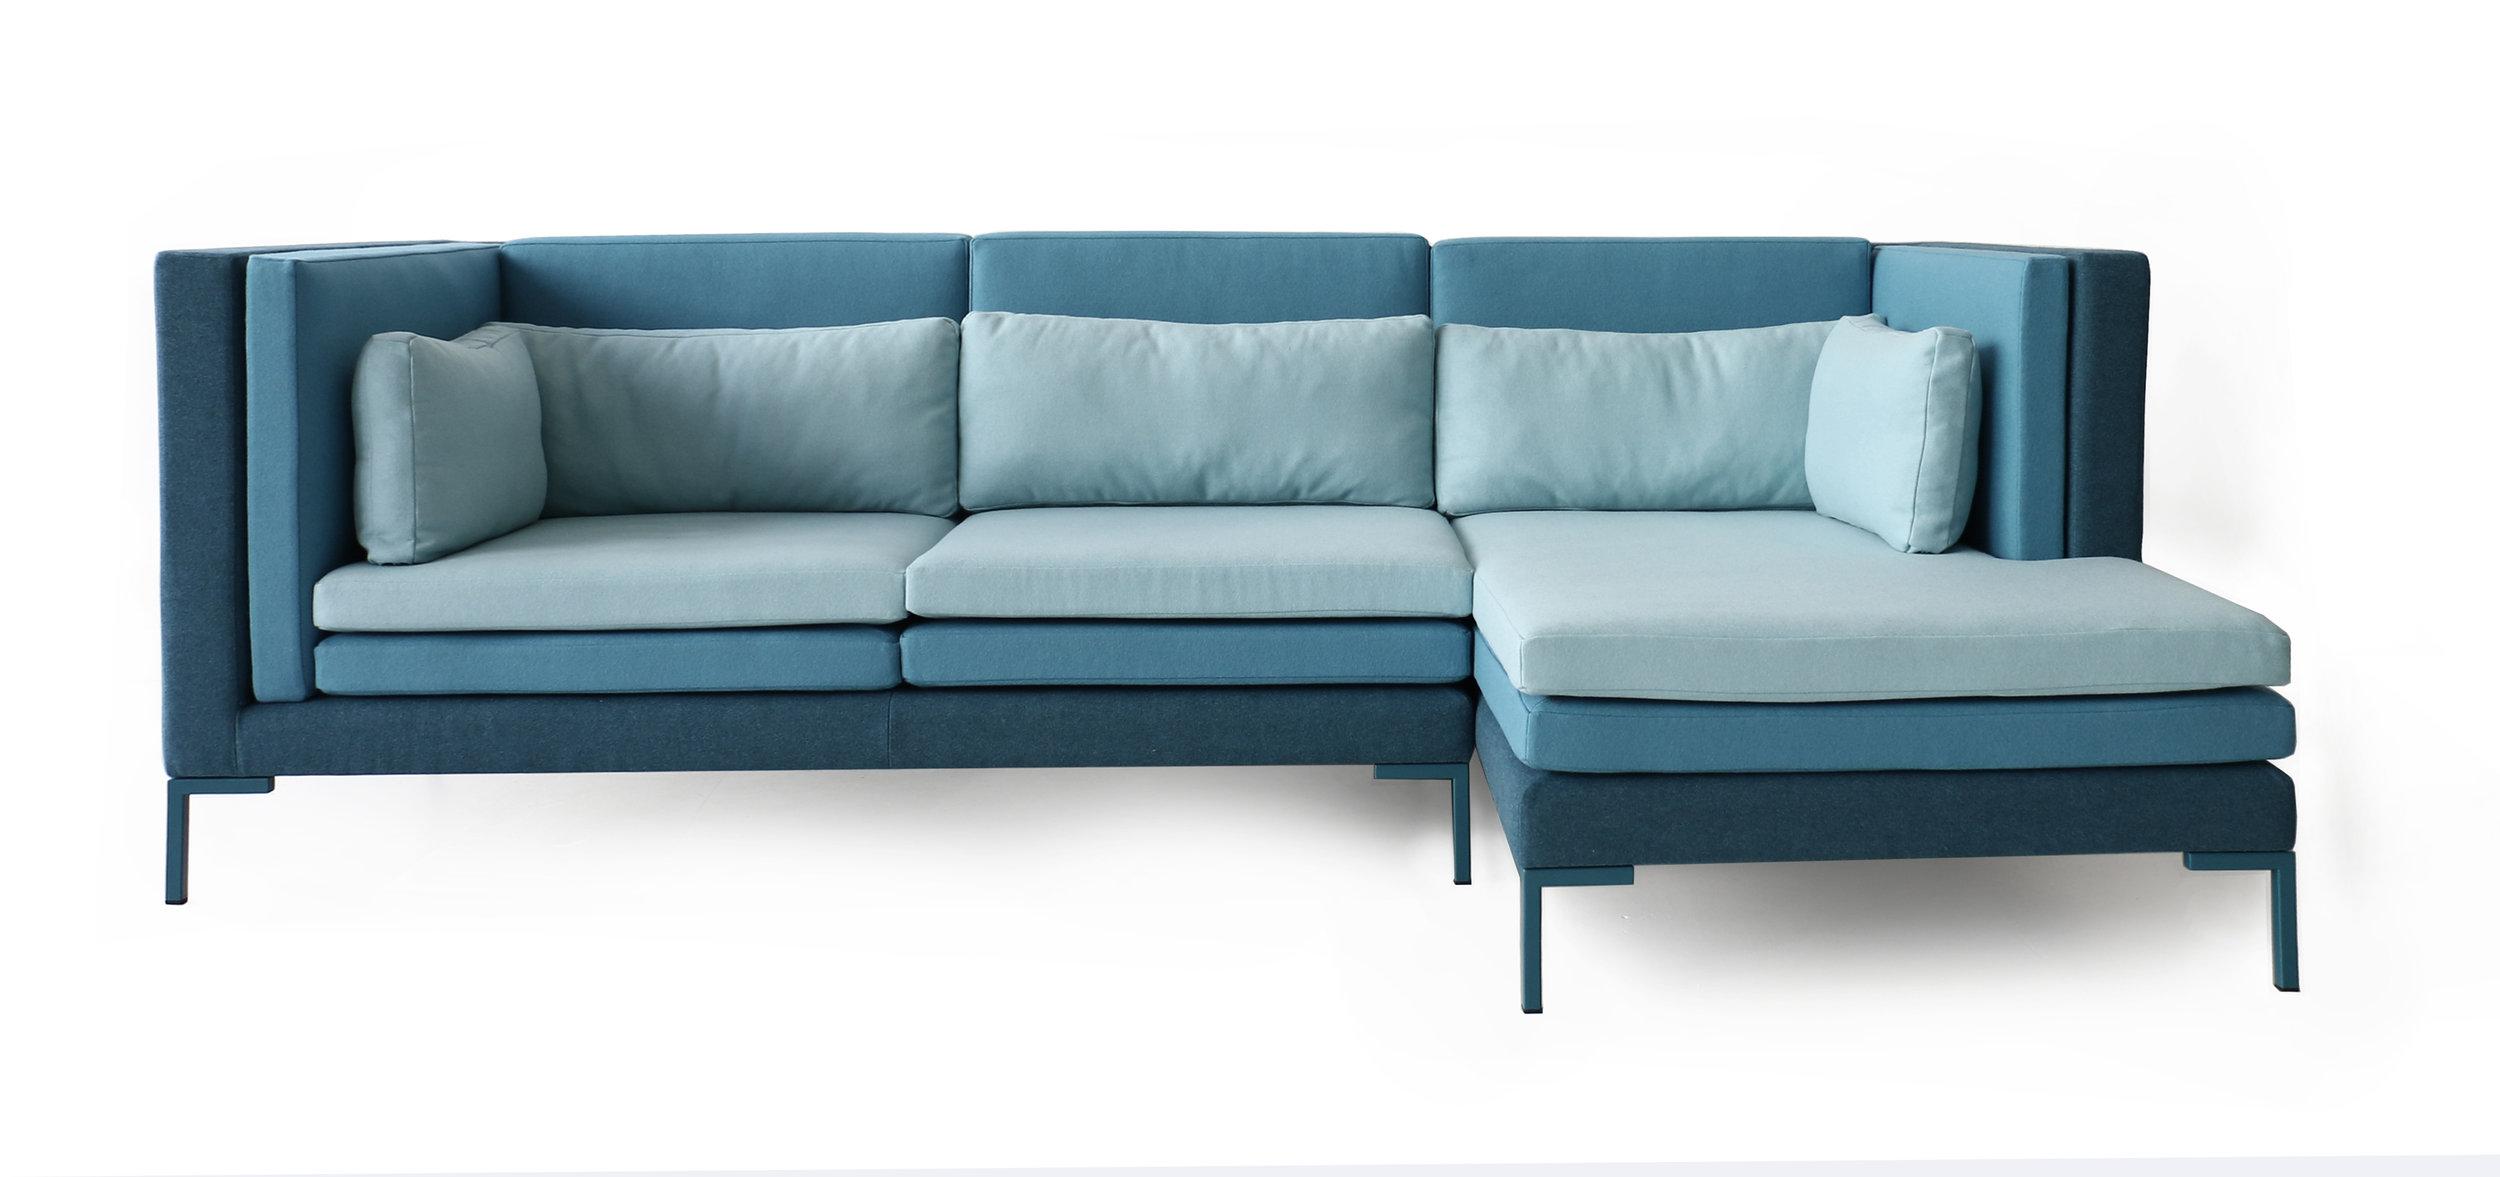 Layer aqua bluedireito.jpg